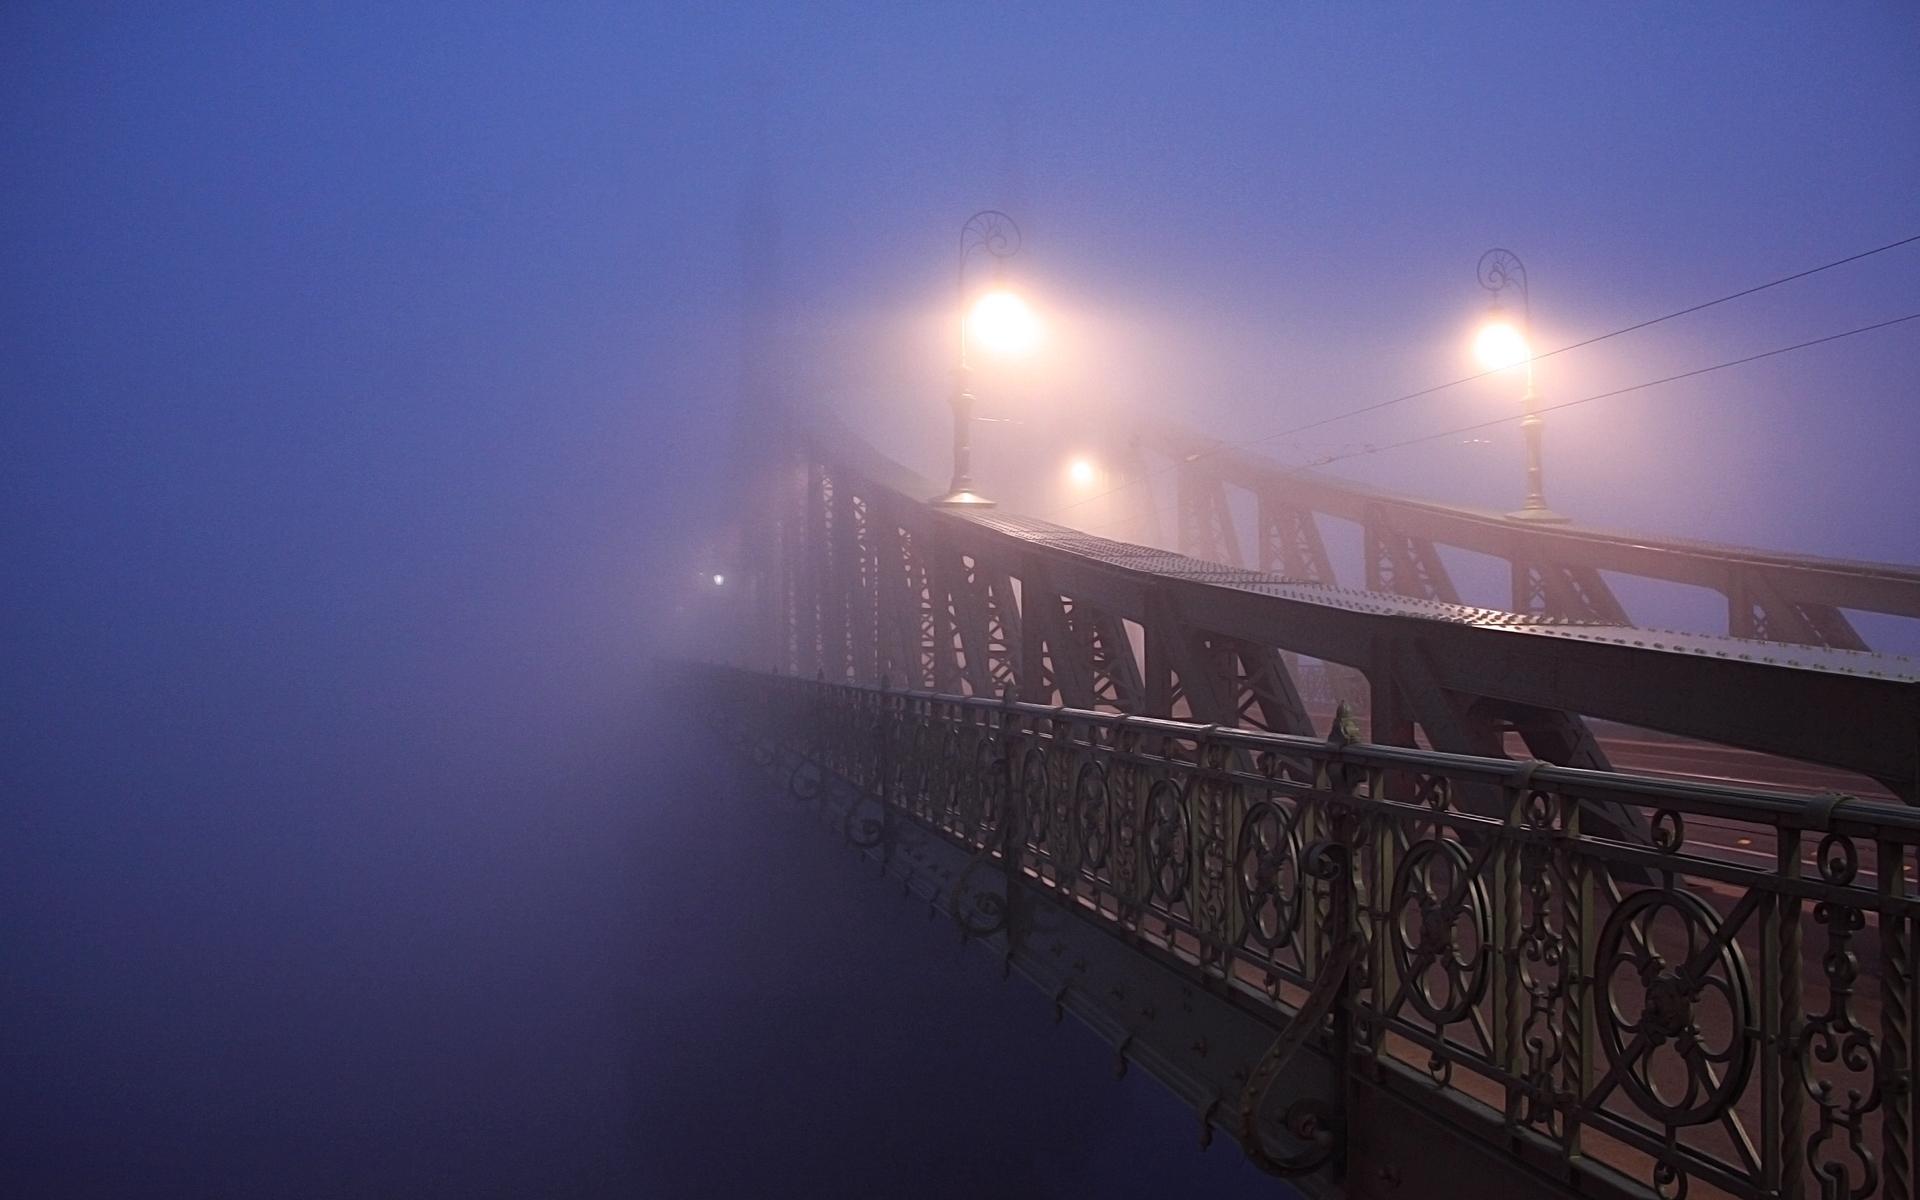 мост фонари море небо  № 3388193 загрузить